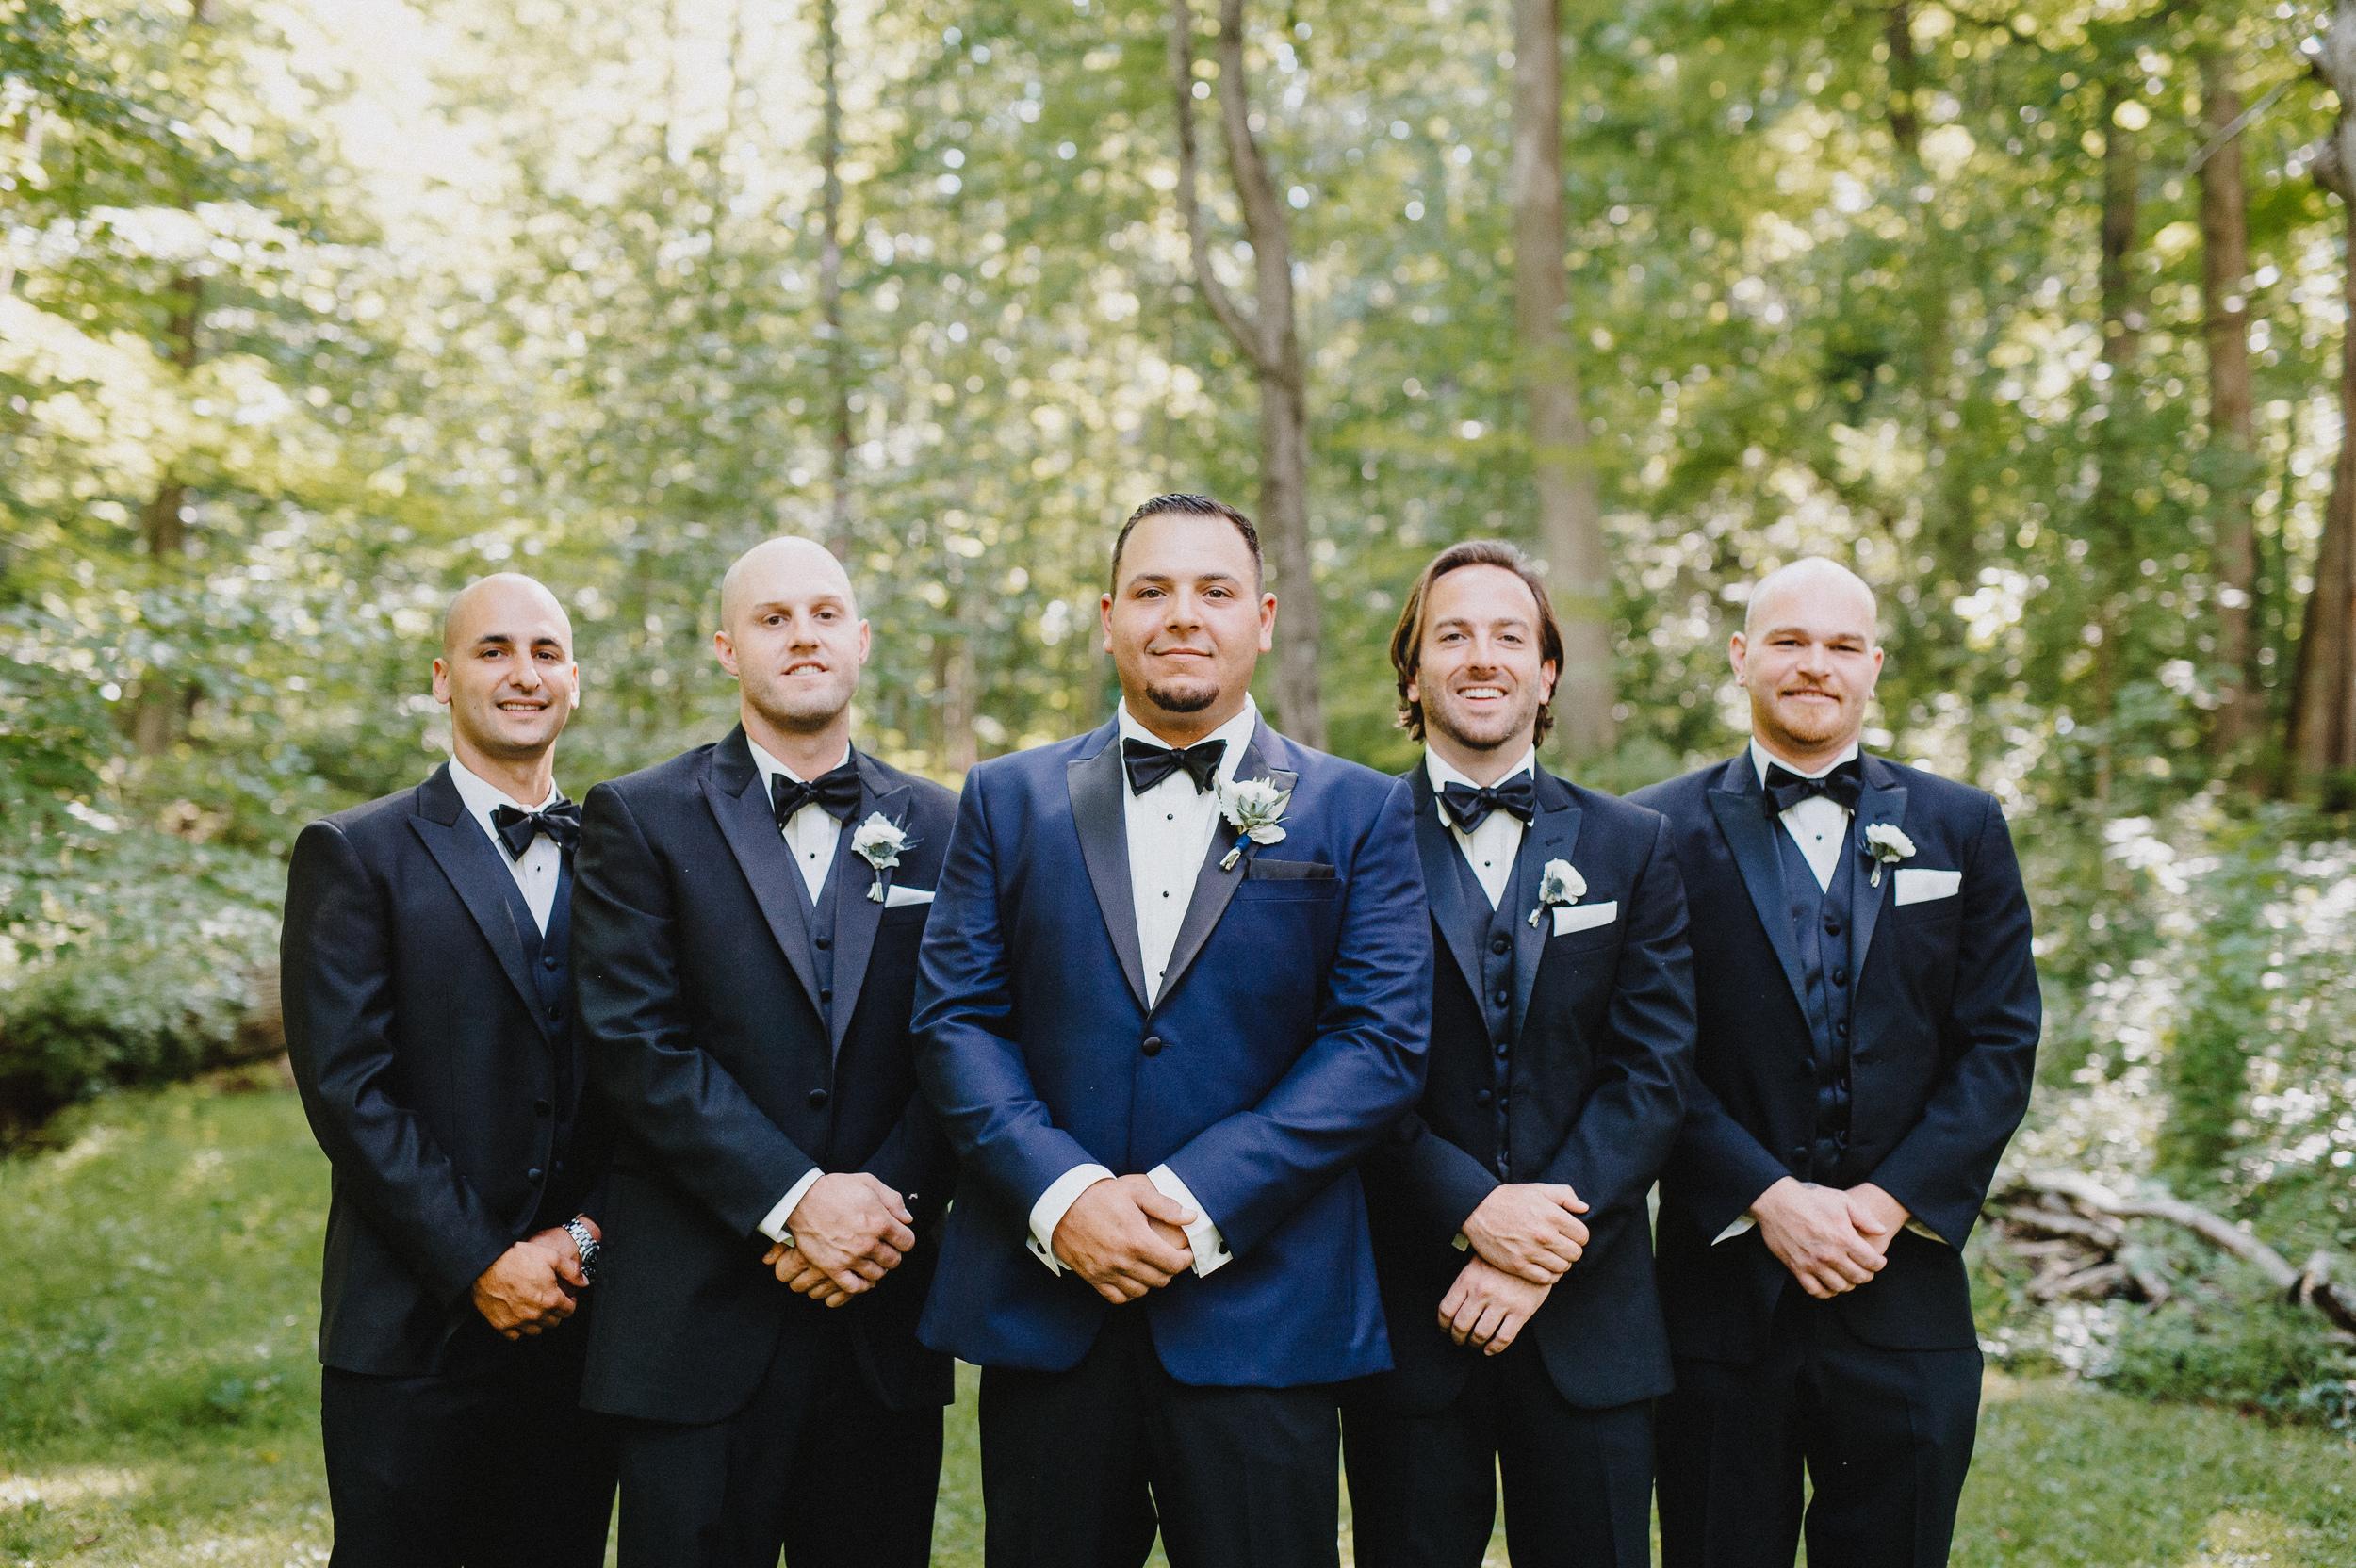 holly-hedge-estate-wedding-photographer-pat-robinson-photography-29.jpg